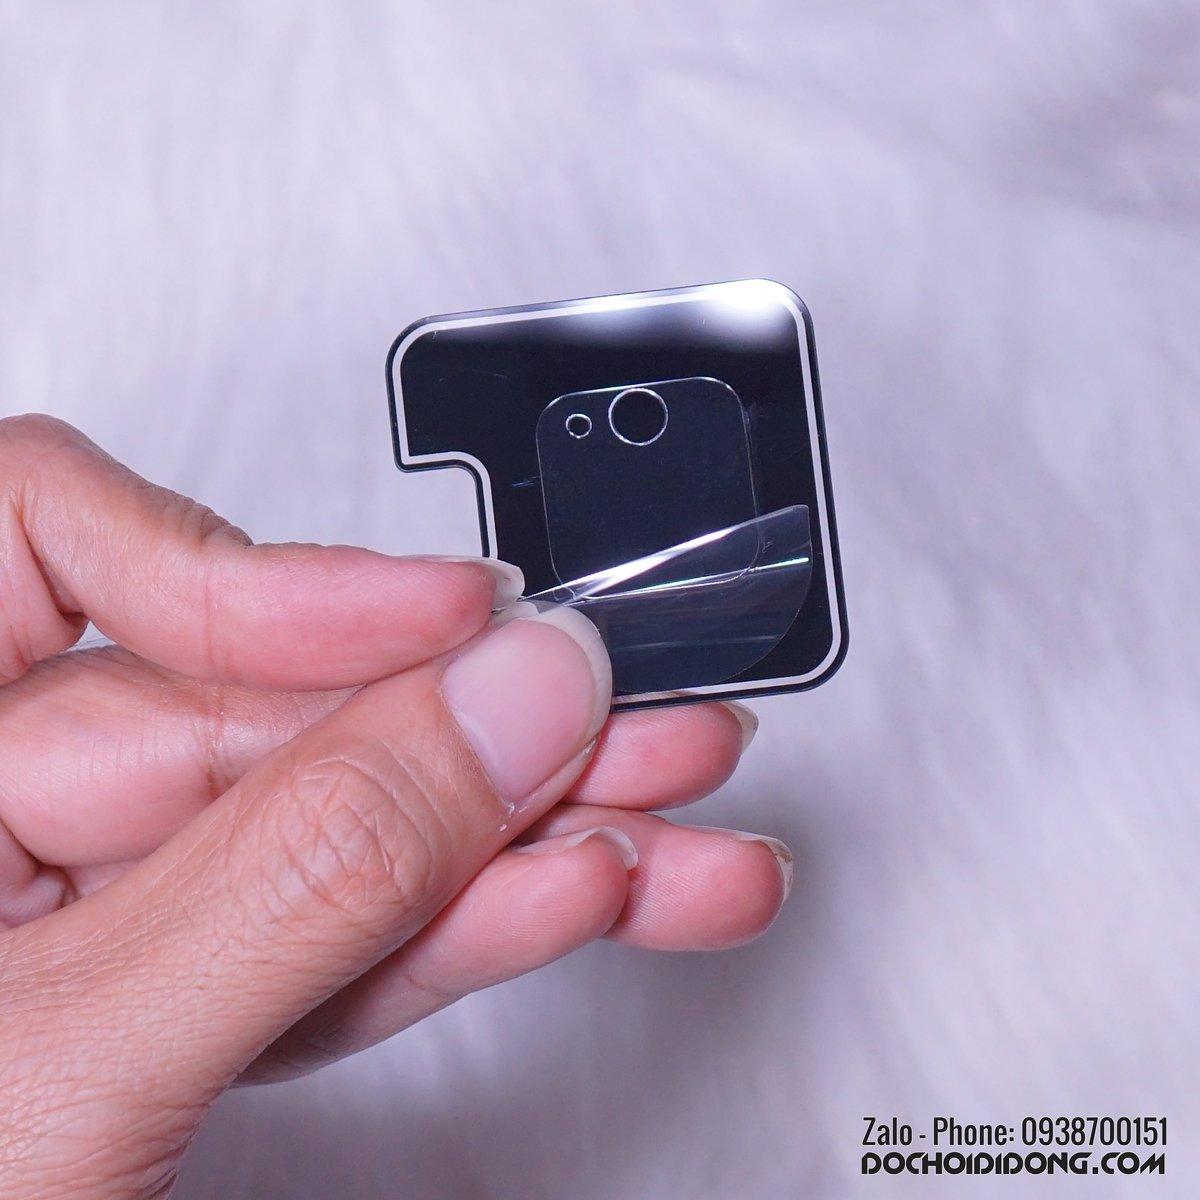 dan-cuong-luc-camera-google-pixel-4-va-pixel-4-xl-chong-tray-chong-vo